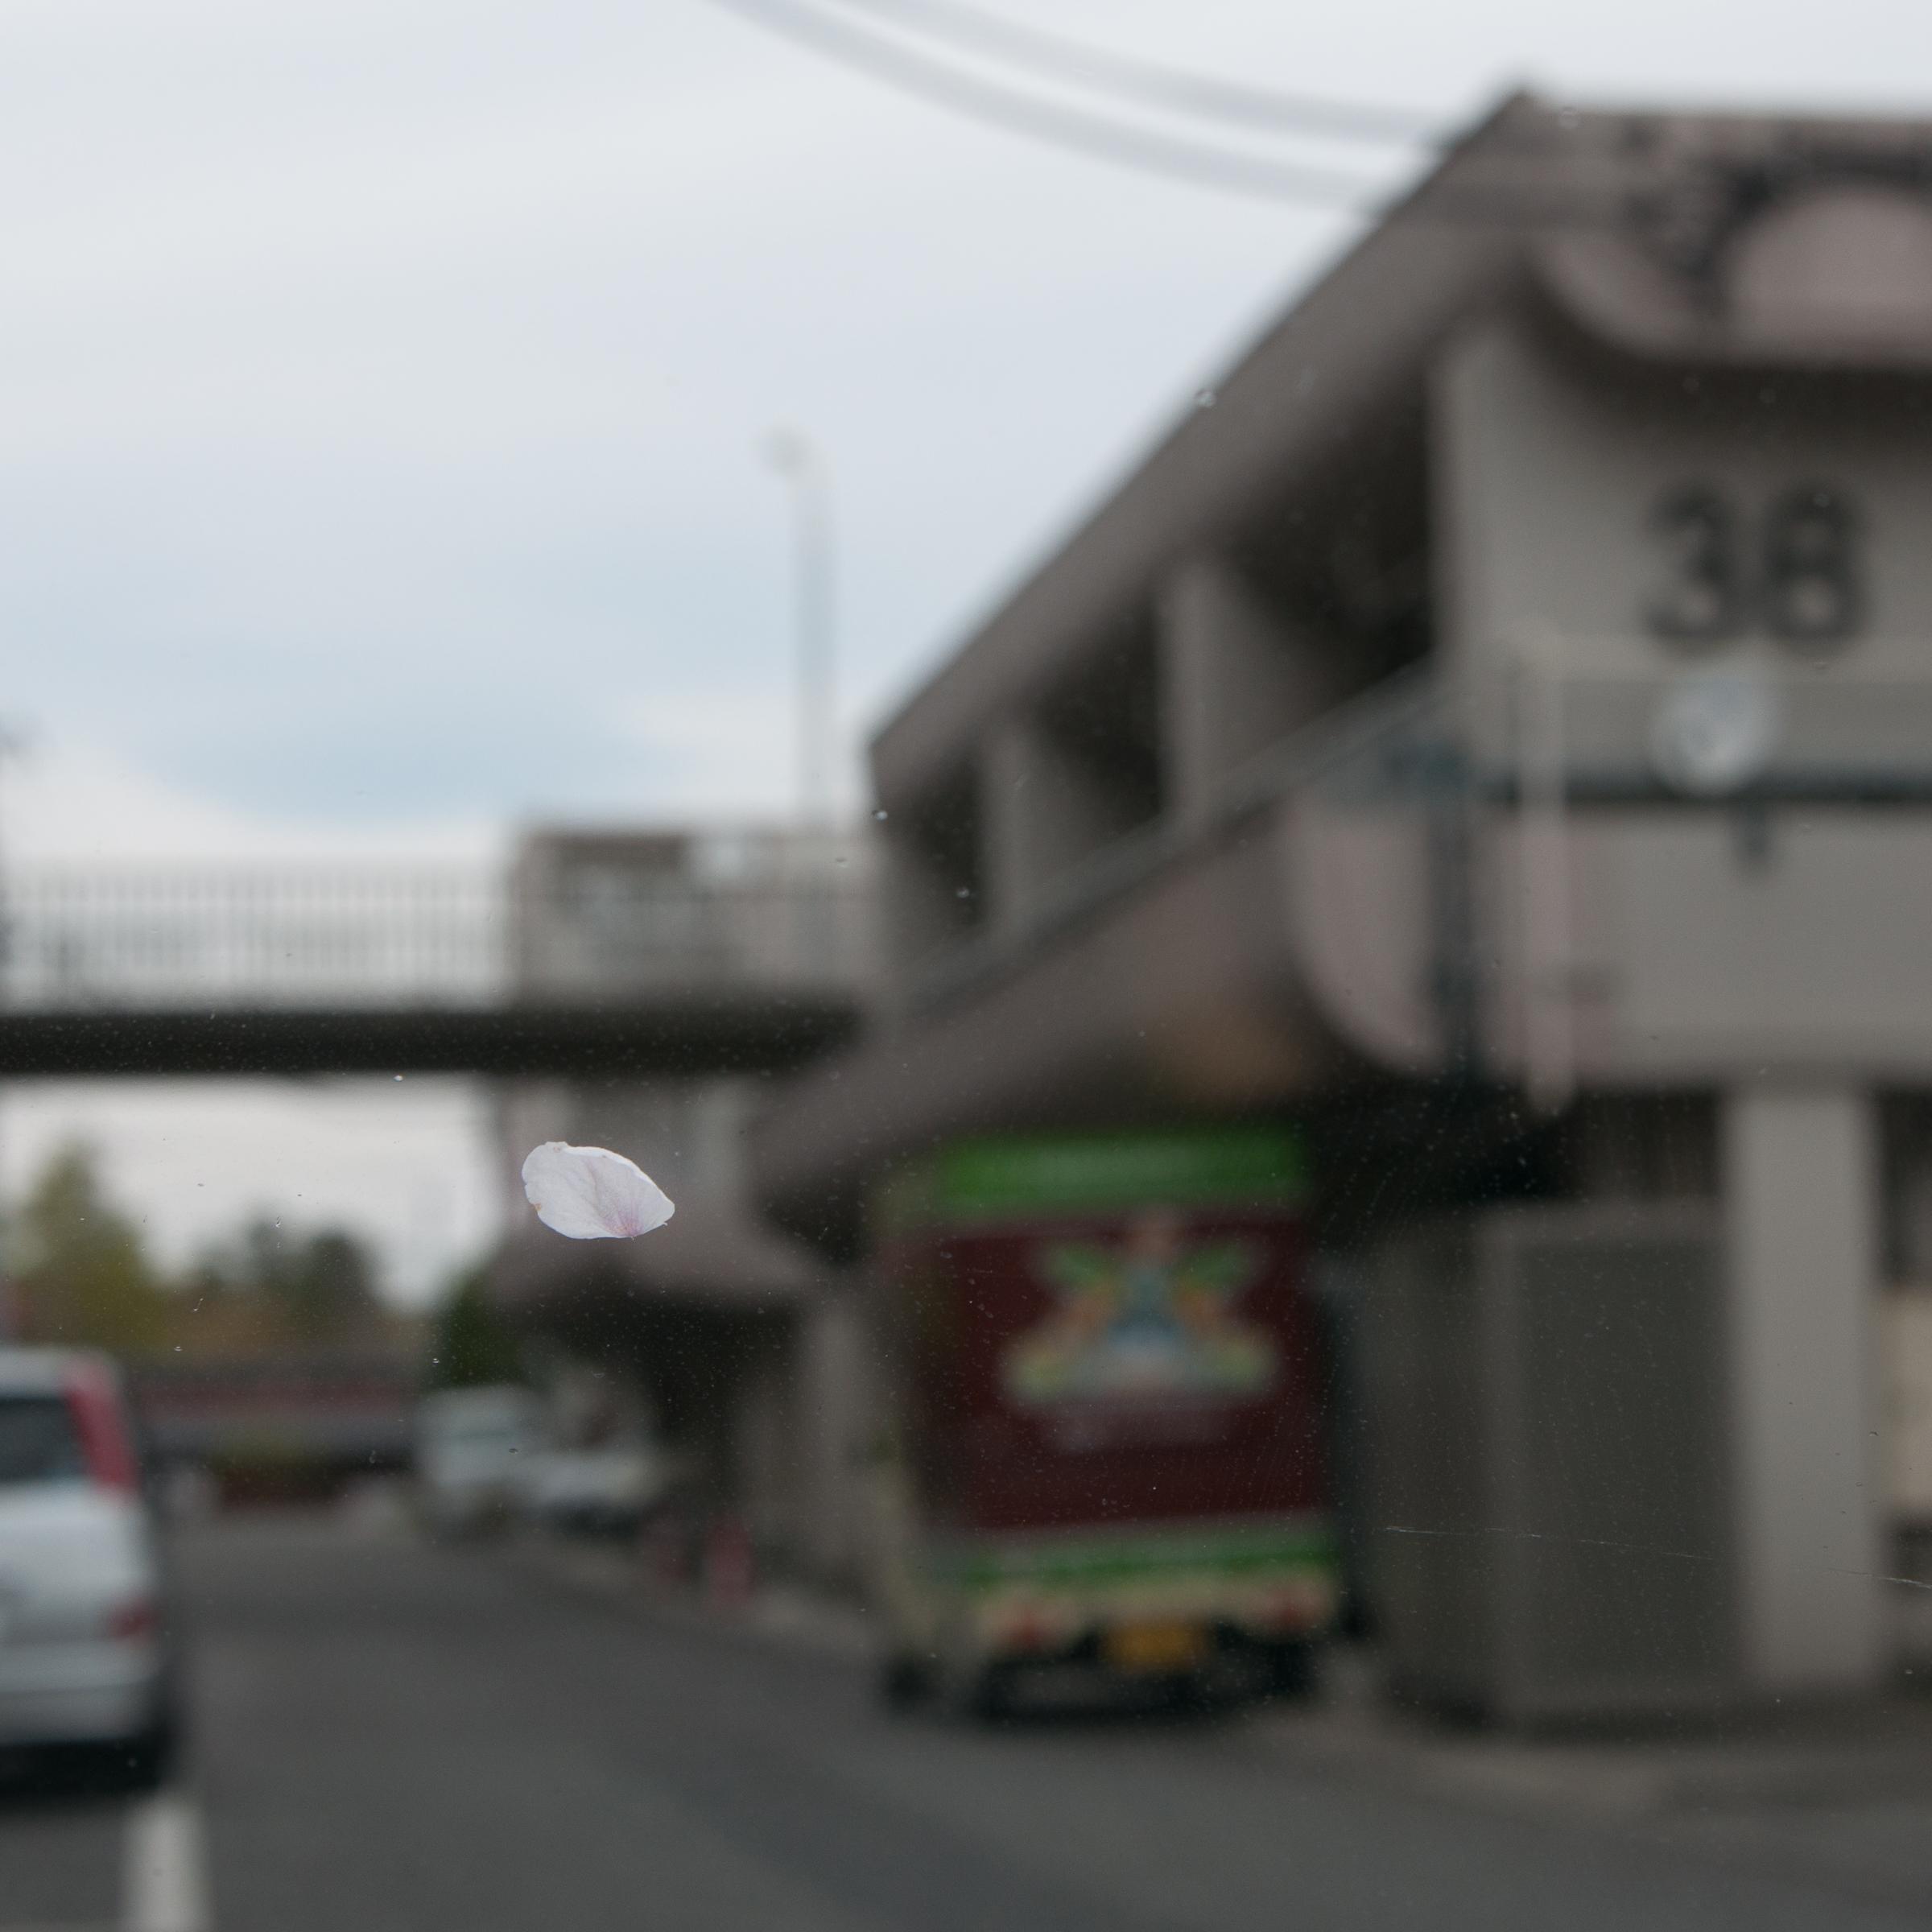 f:id:kota2009:20190414113451j:plain